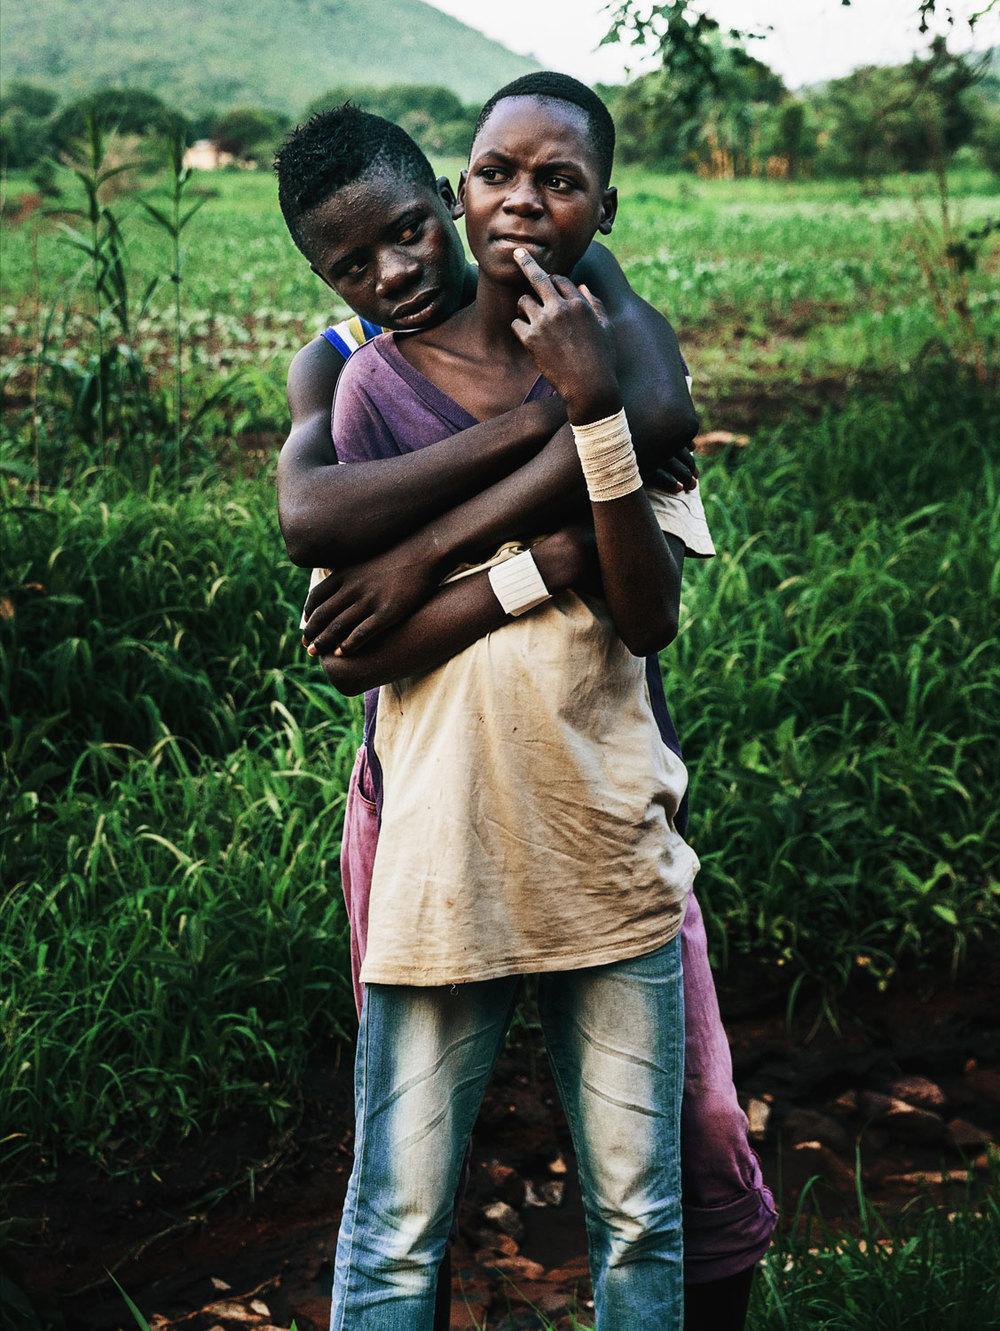 CallieGiovanna_Africa_Zambia_Chipata_20150101_05671.jpg